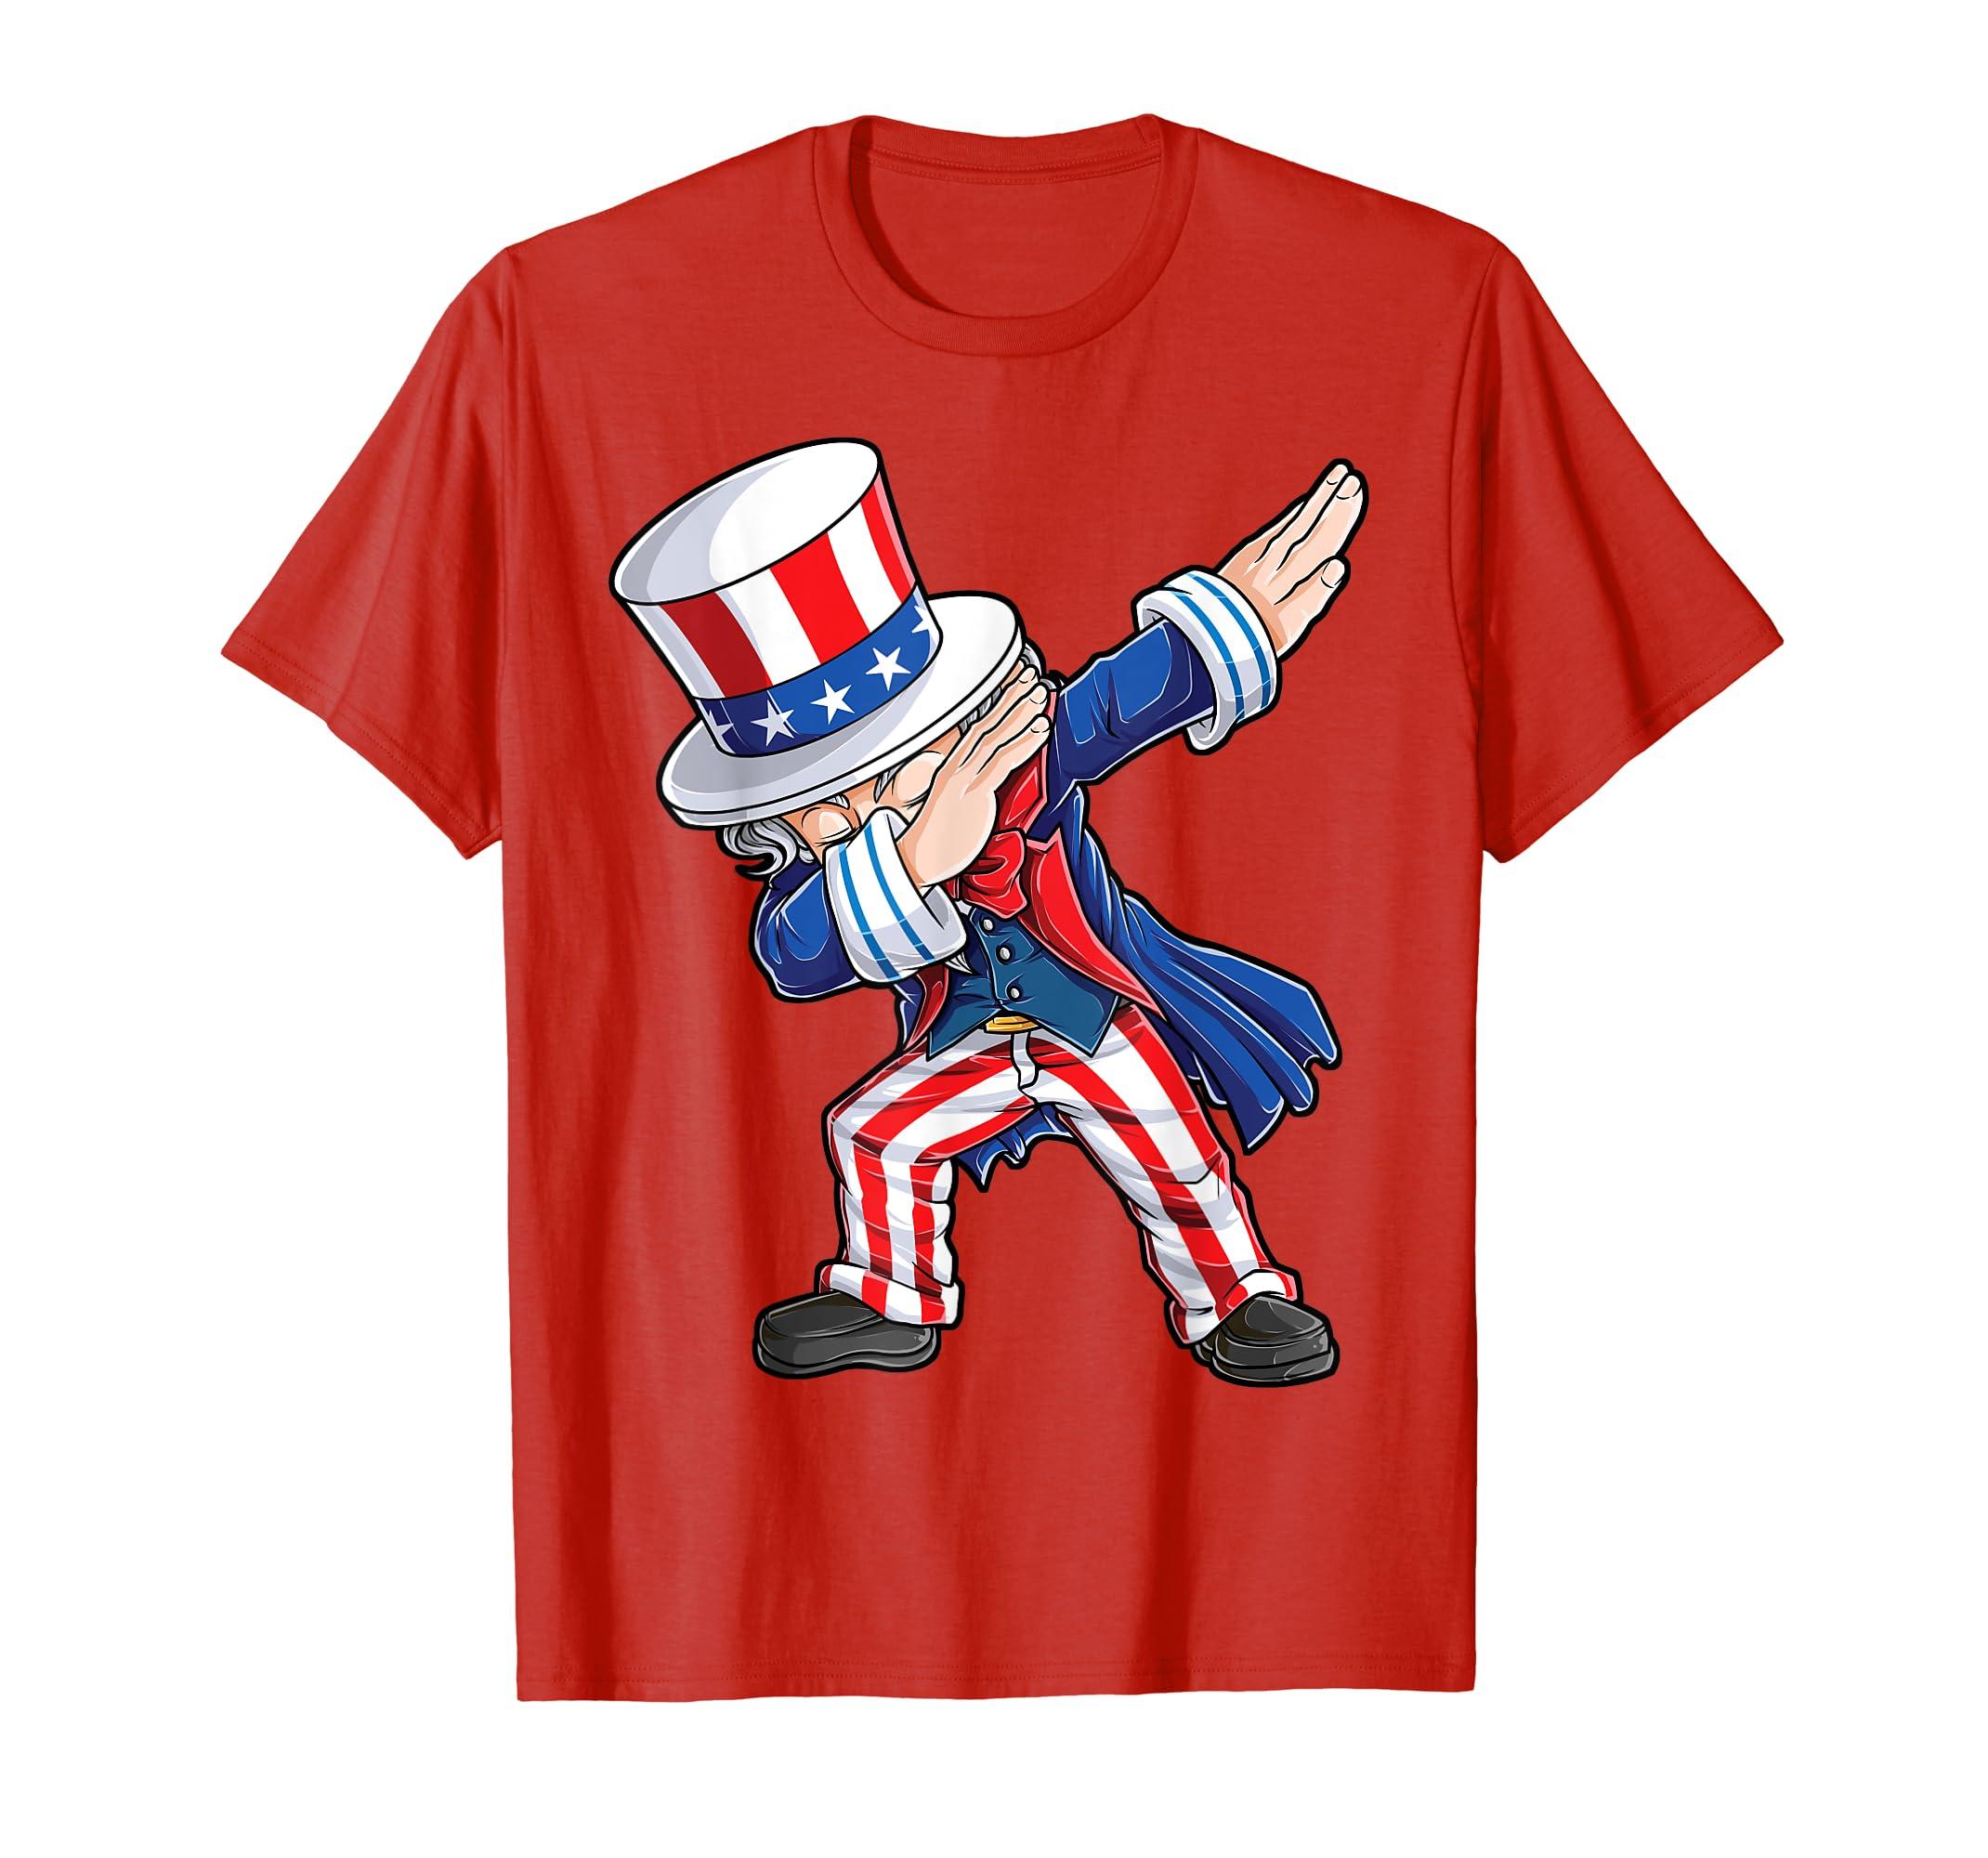 5d709adaaa743 Amazon.com  Dabbing Uncle Sam T Shirt 4th of July Kids Boys Men Gifts   Clothing